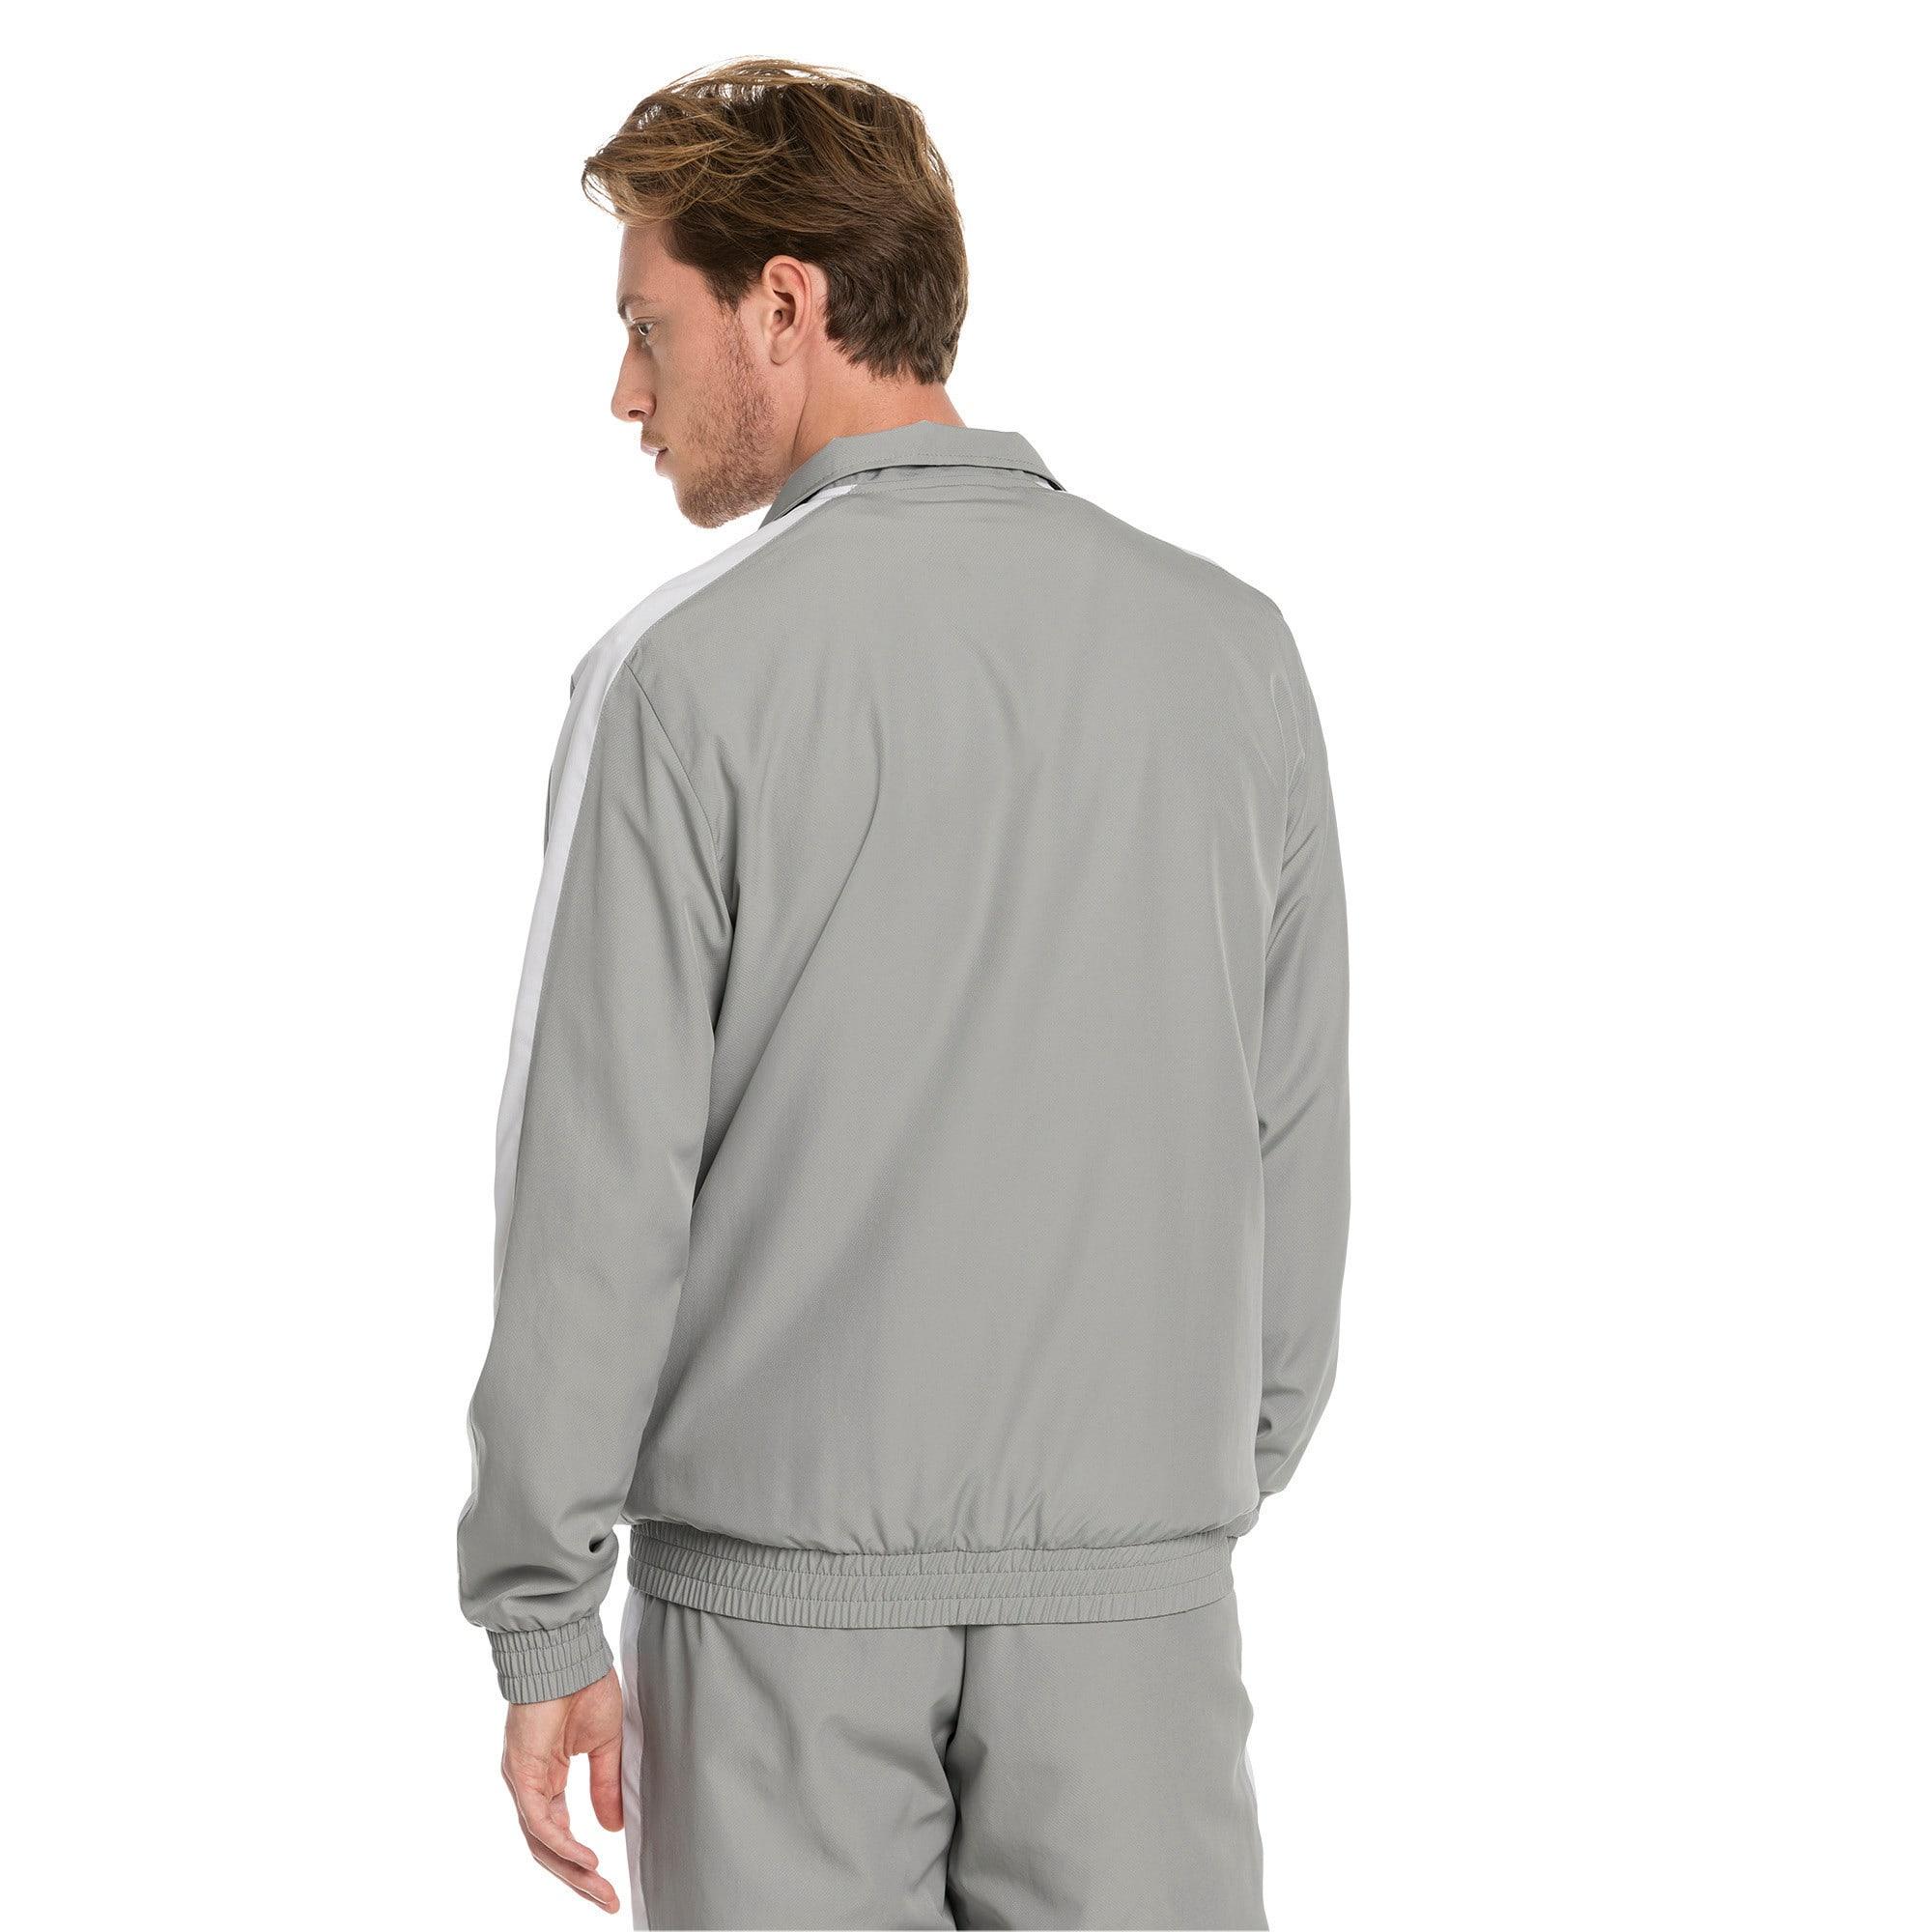 Thumbnail 3 of Iconic T7 Woven Men's Track Jacket, Limestone, medium-IND